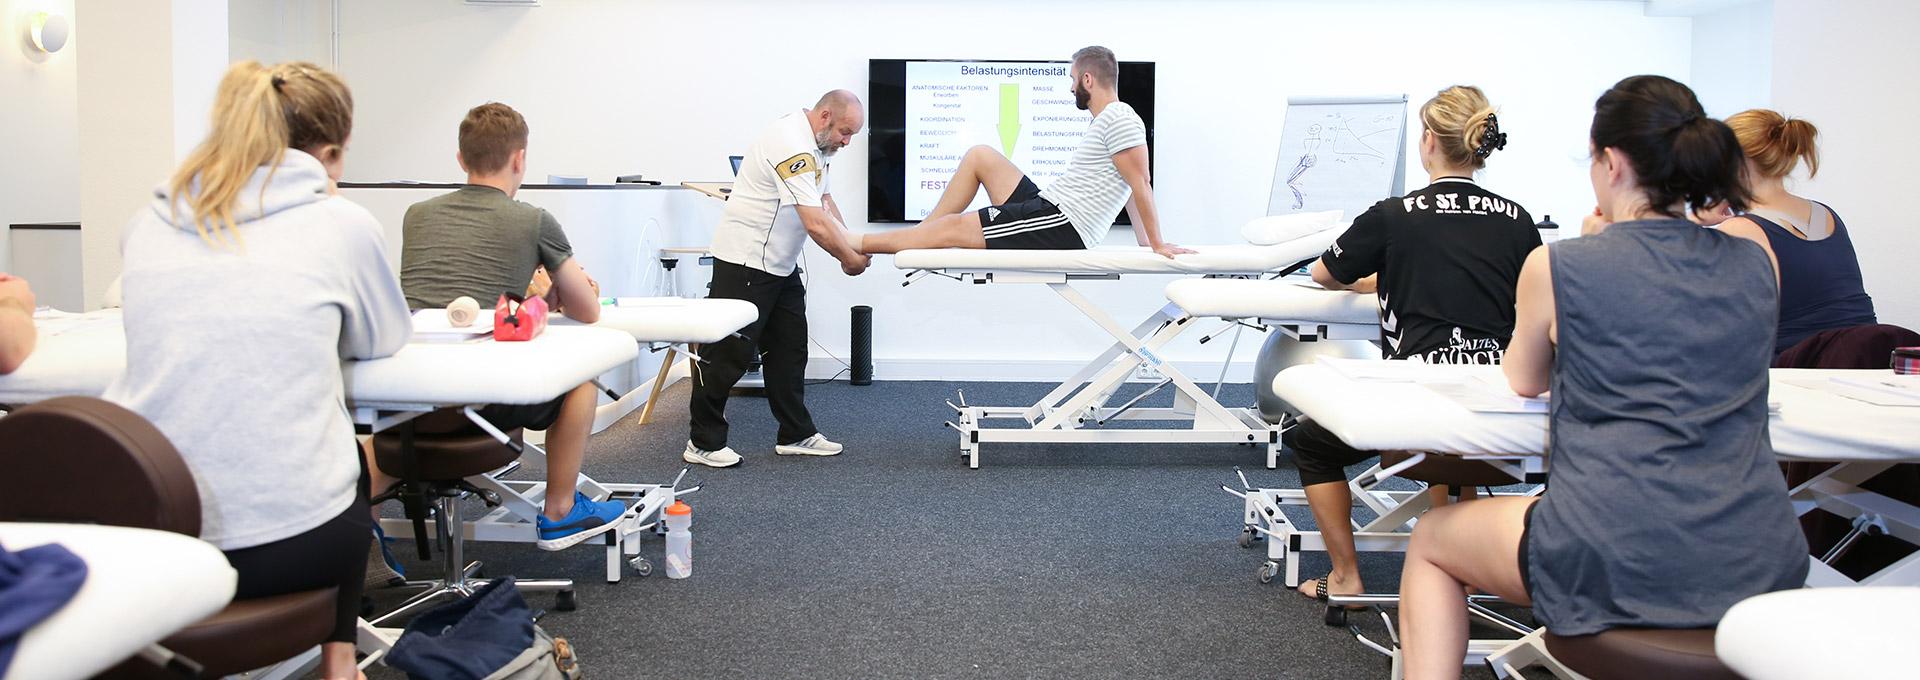 1920x680 6830 Akademie Physiotherapie Schueler